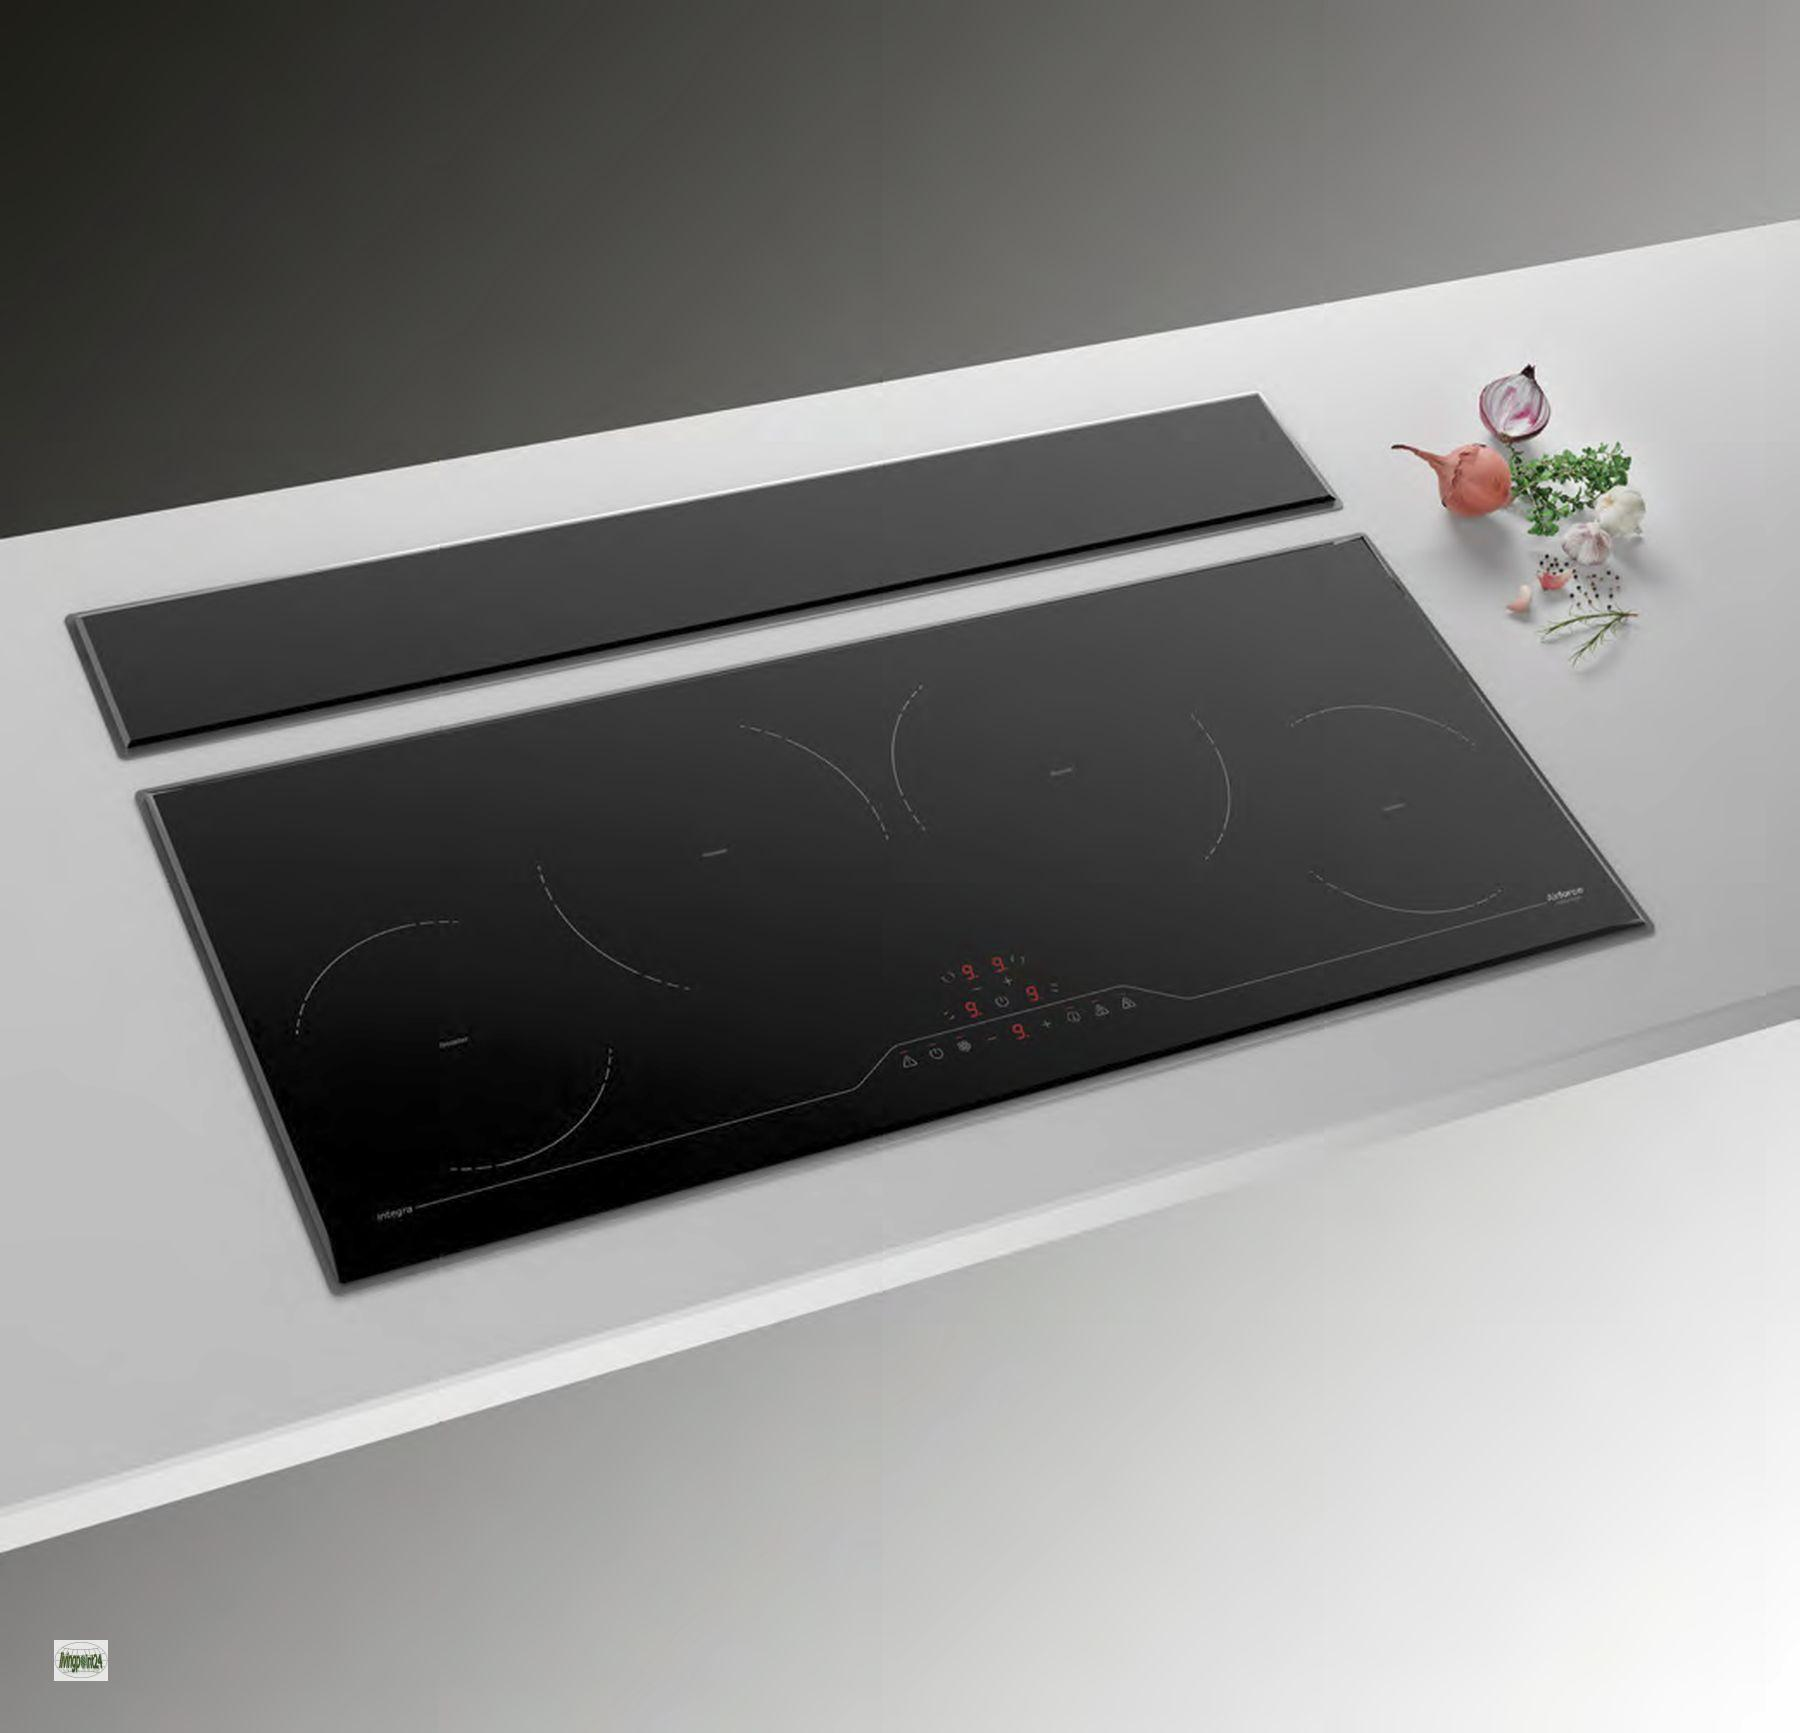 induktions kochfeld 4 kochfelder timer abzugshaube edelstahl glas touch 551255 ebay. Black Bedroom Furniture Sets. Home Design Ideas